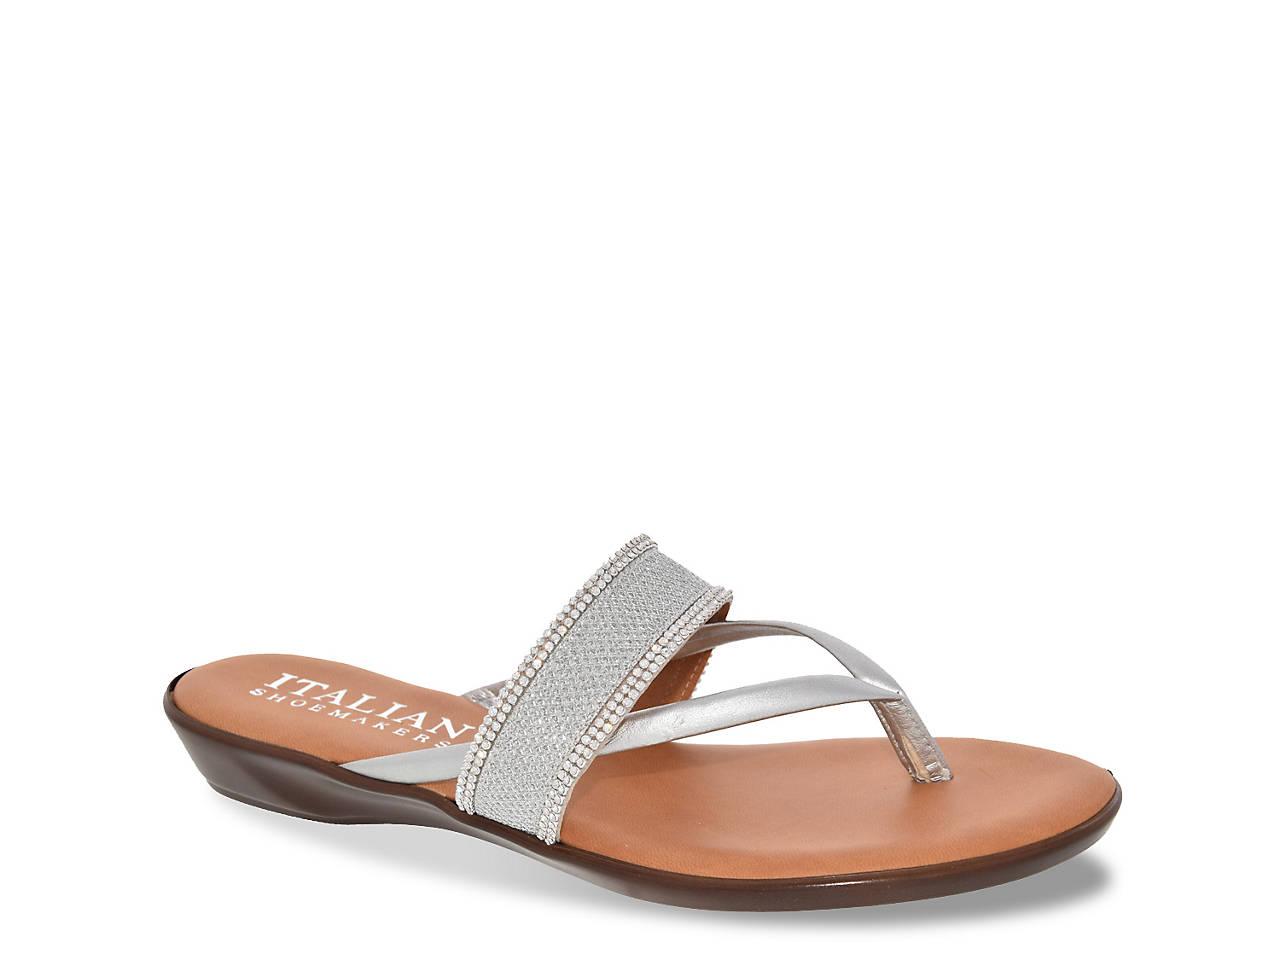 67c06ab92 Italian Shoemakers Kloss Sandal Women s Shoes